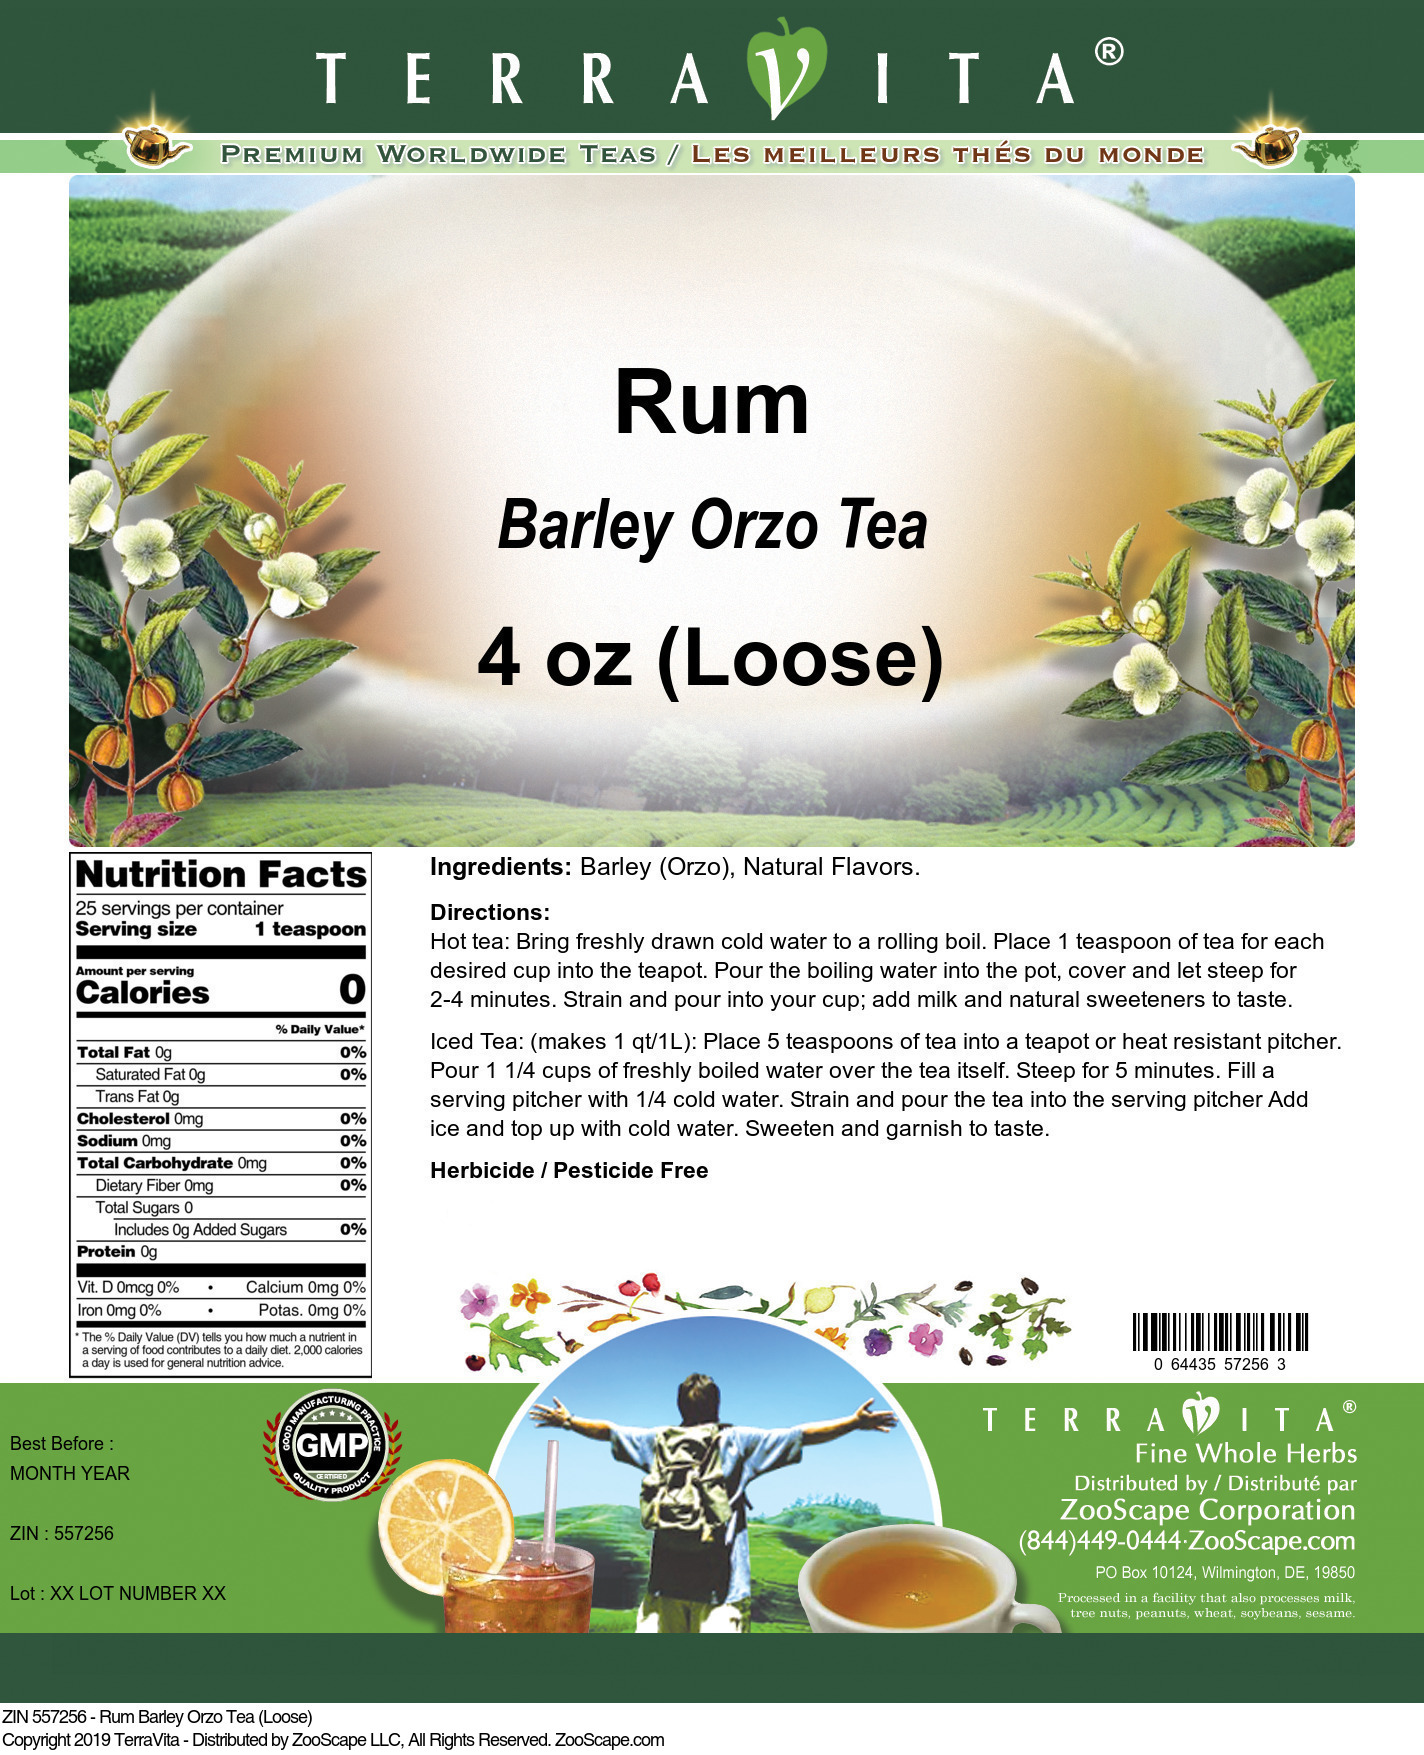 Rum Barley Orzo Tea (Loose)